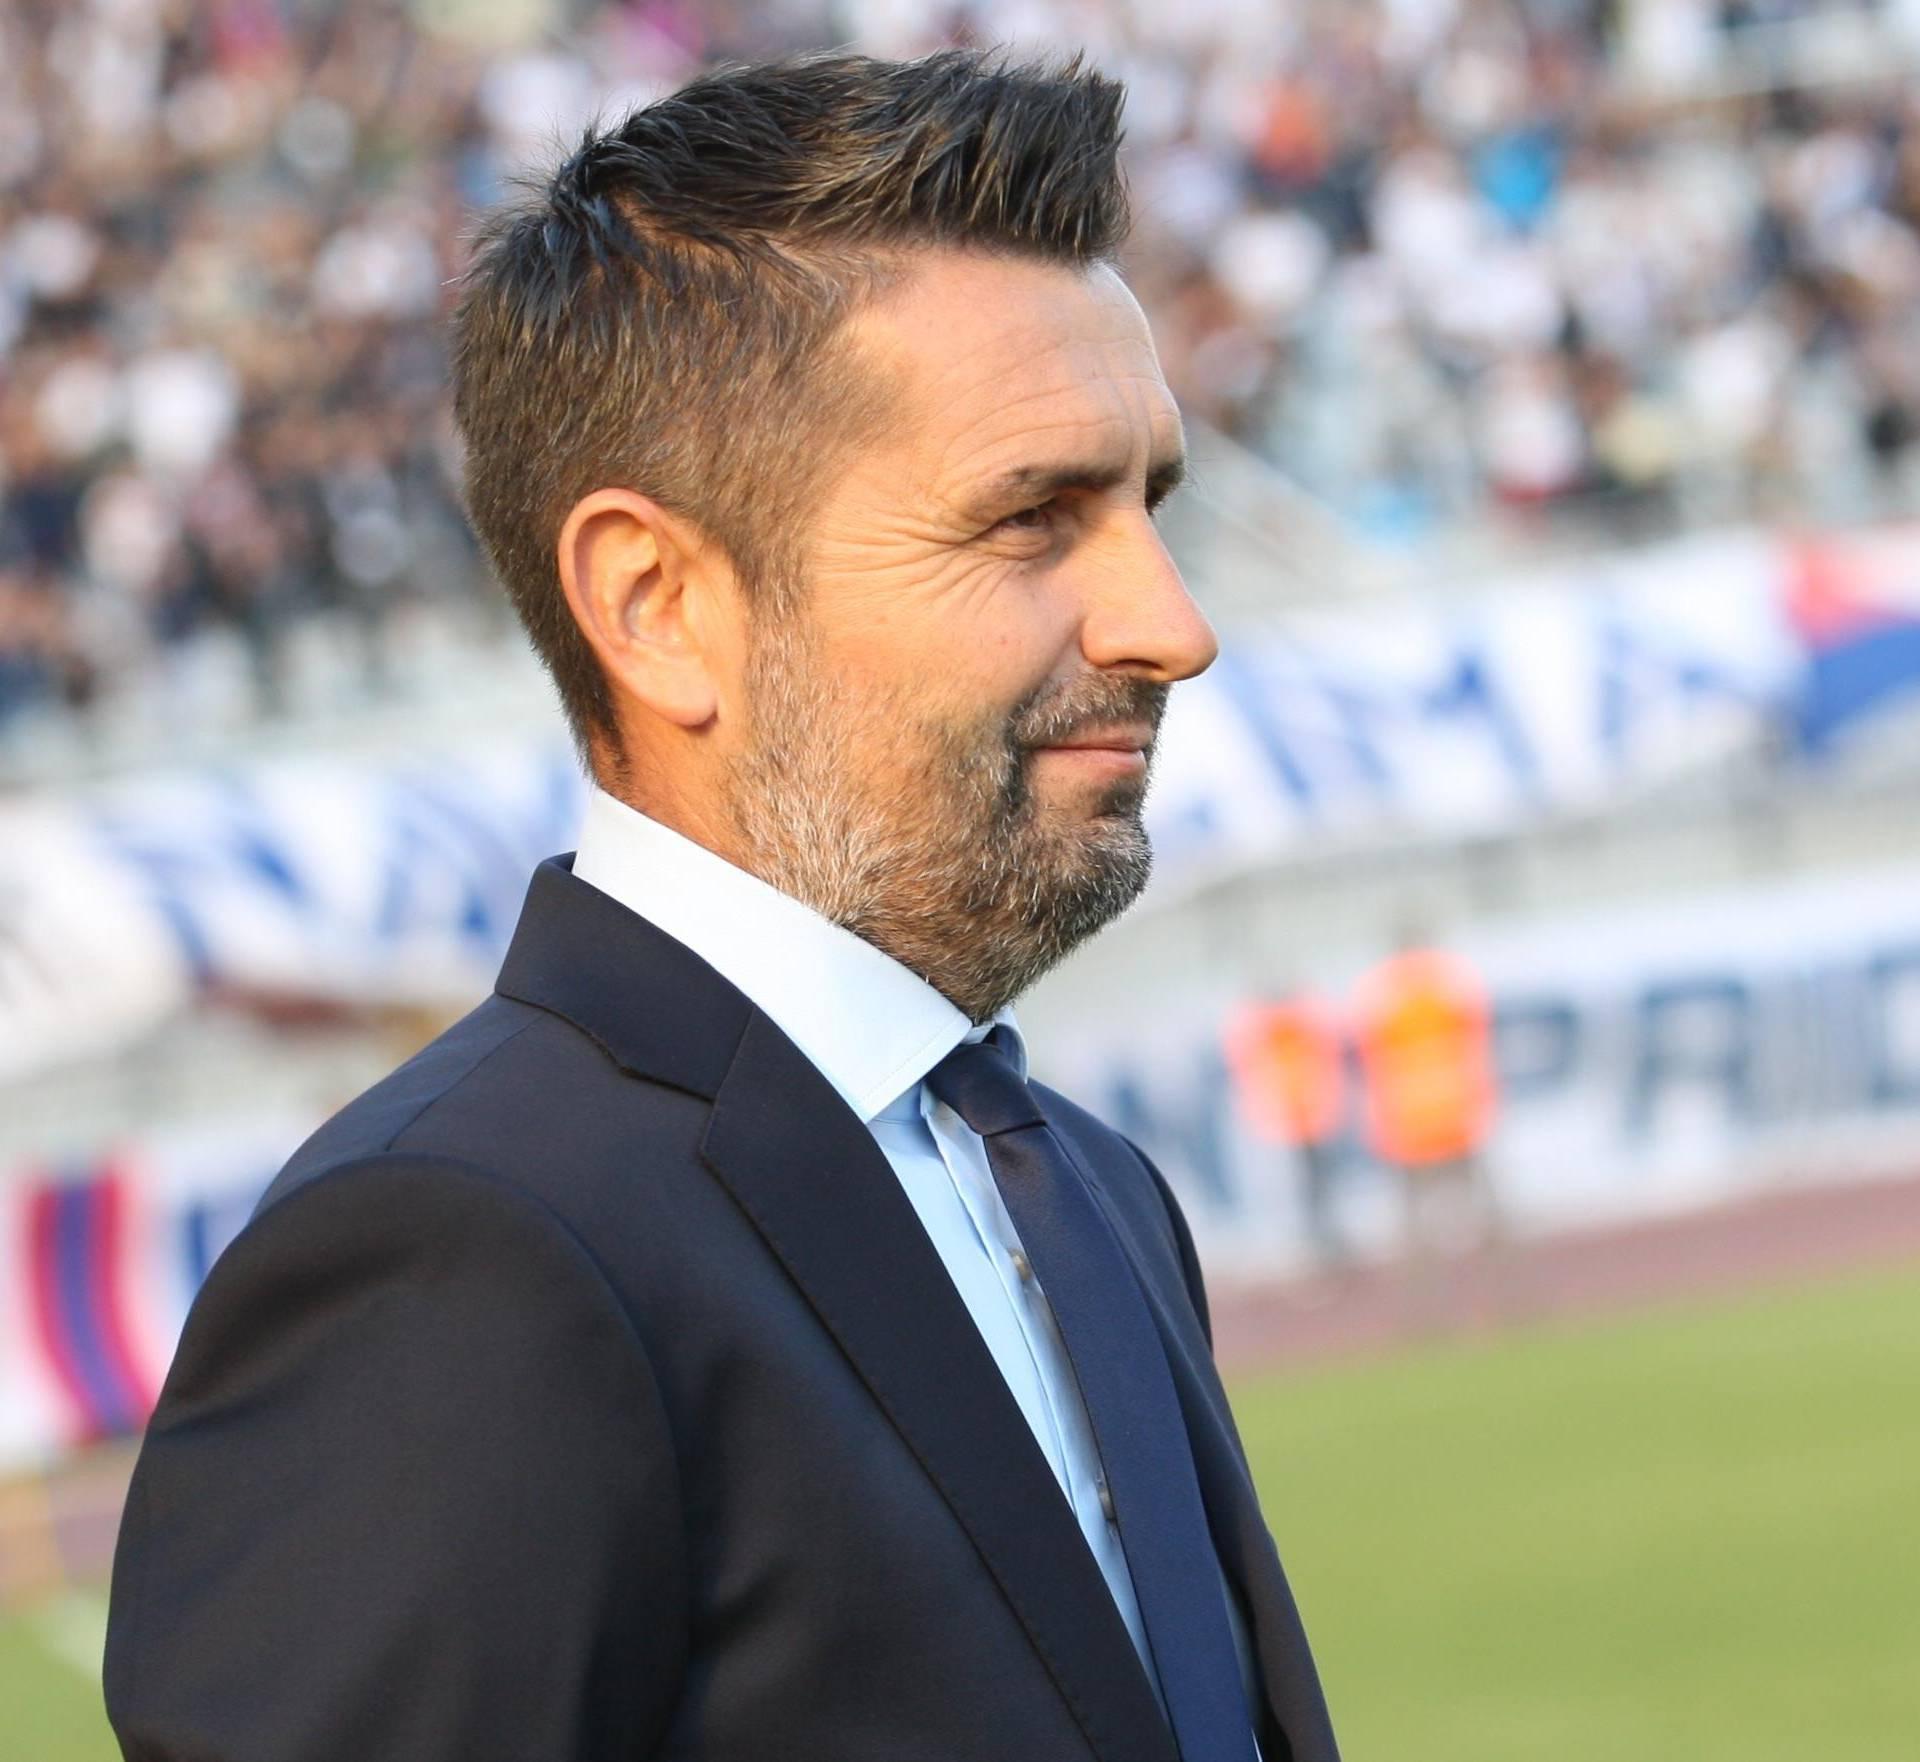 Bjelica: Bio sam zainteresiran za Hajduk, ali nisu me htjeli...